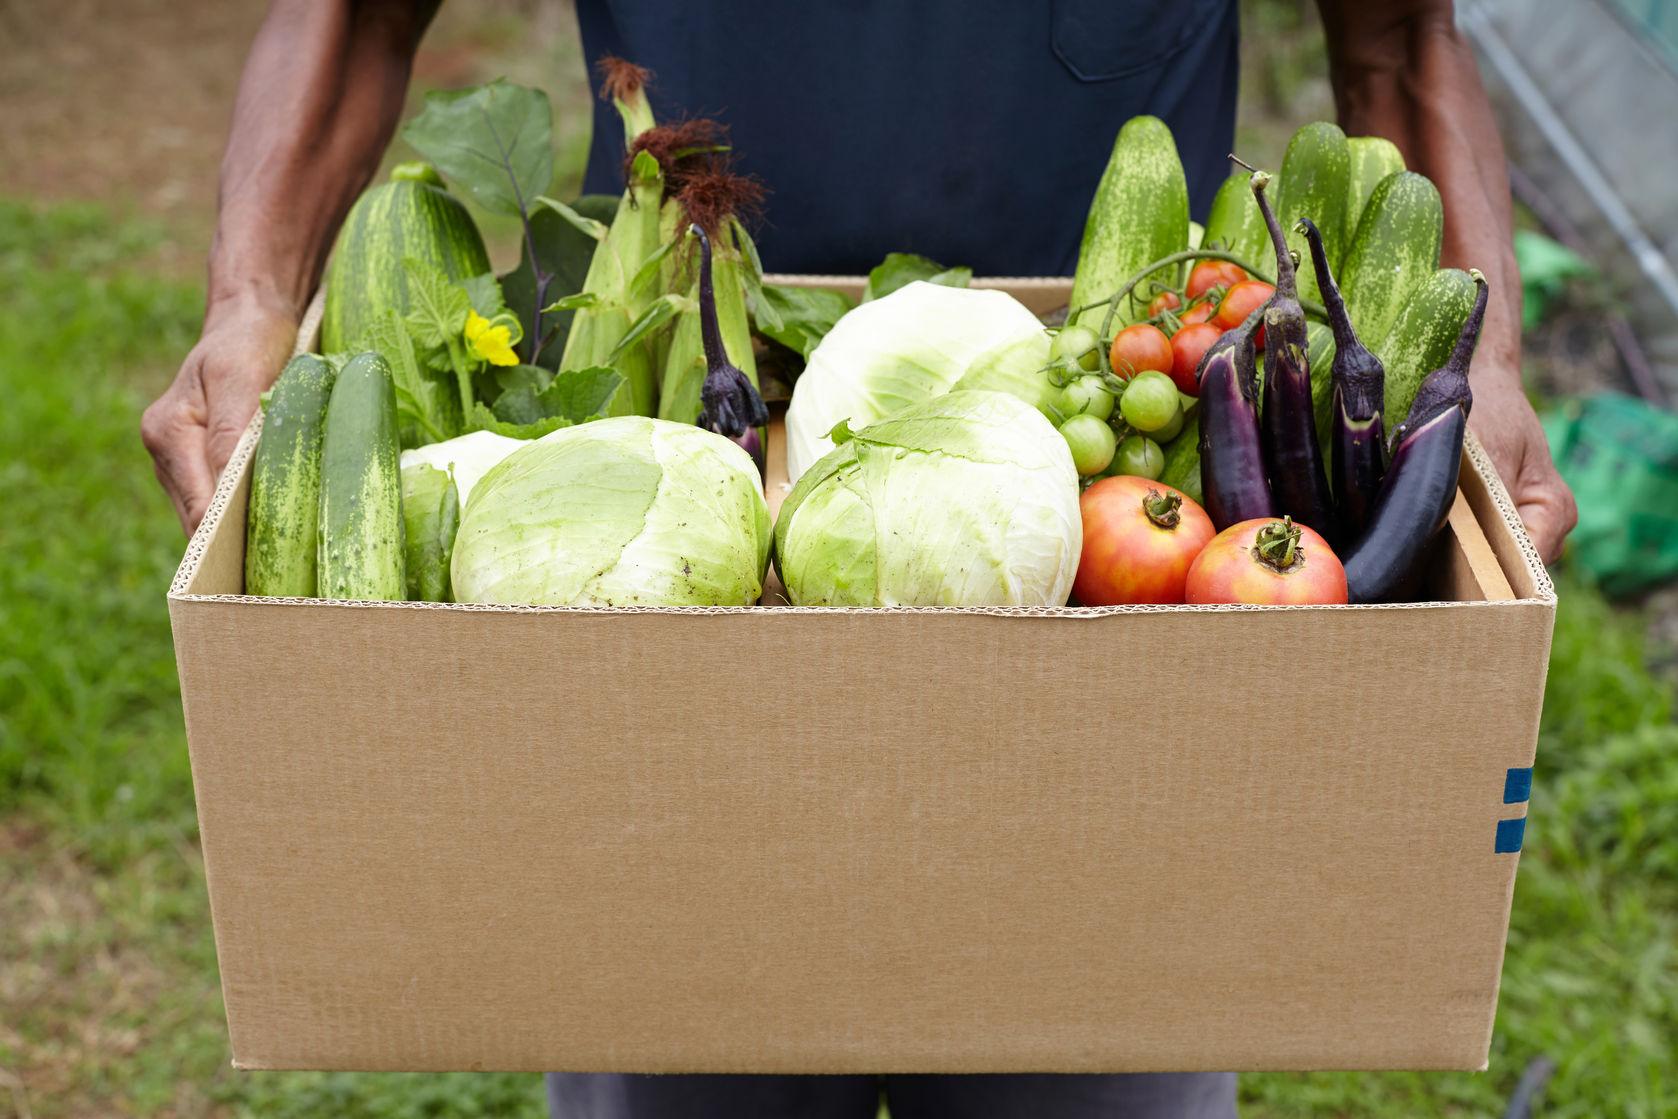 Produce from vegetable garden  https://www.info-on-high-blood-pressure.com/Health-Benefits-Of-Gardening.html